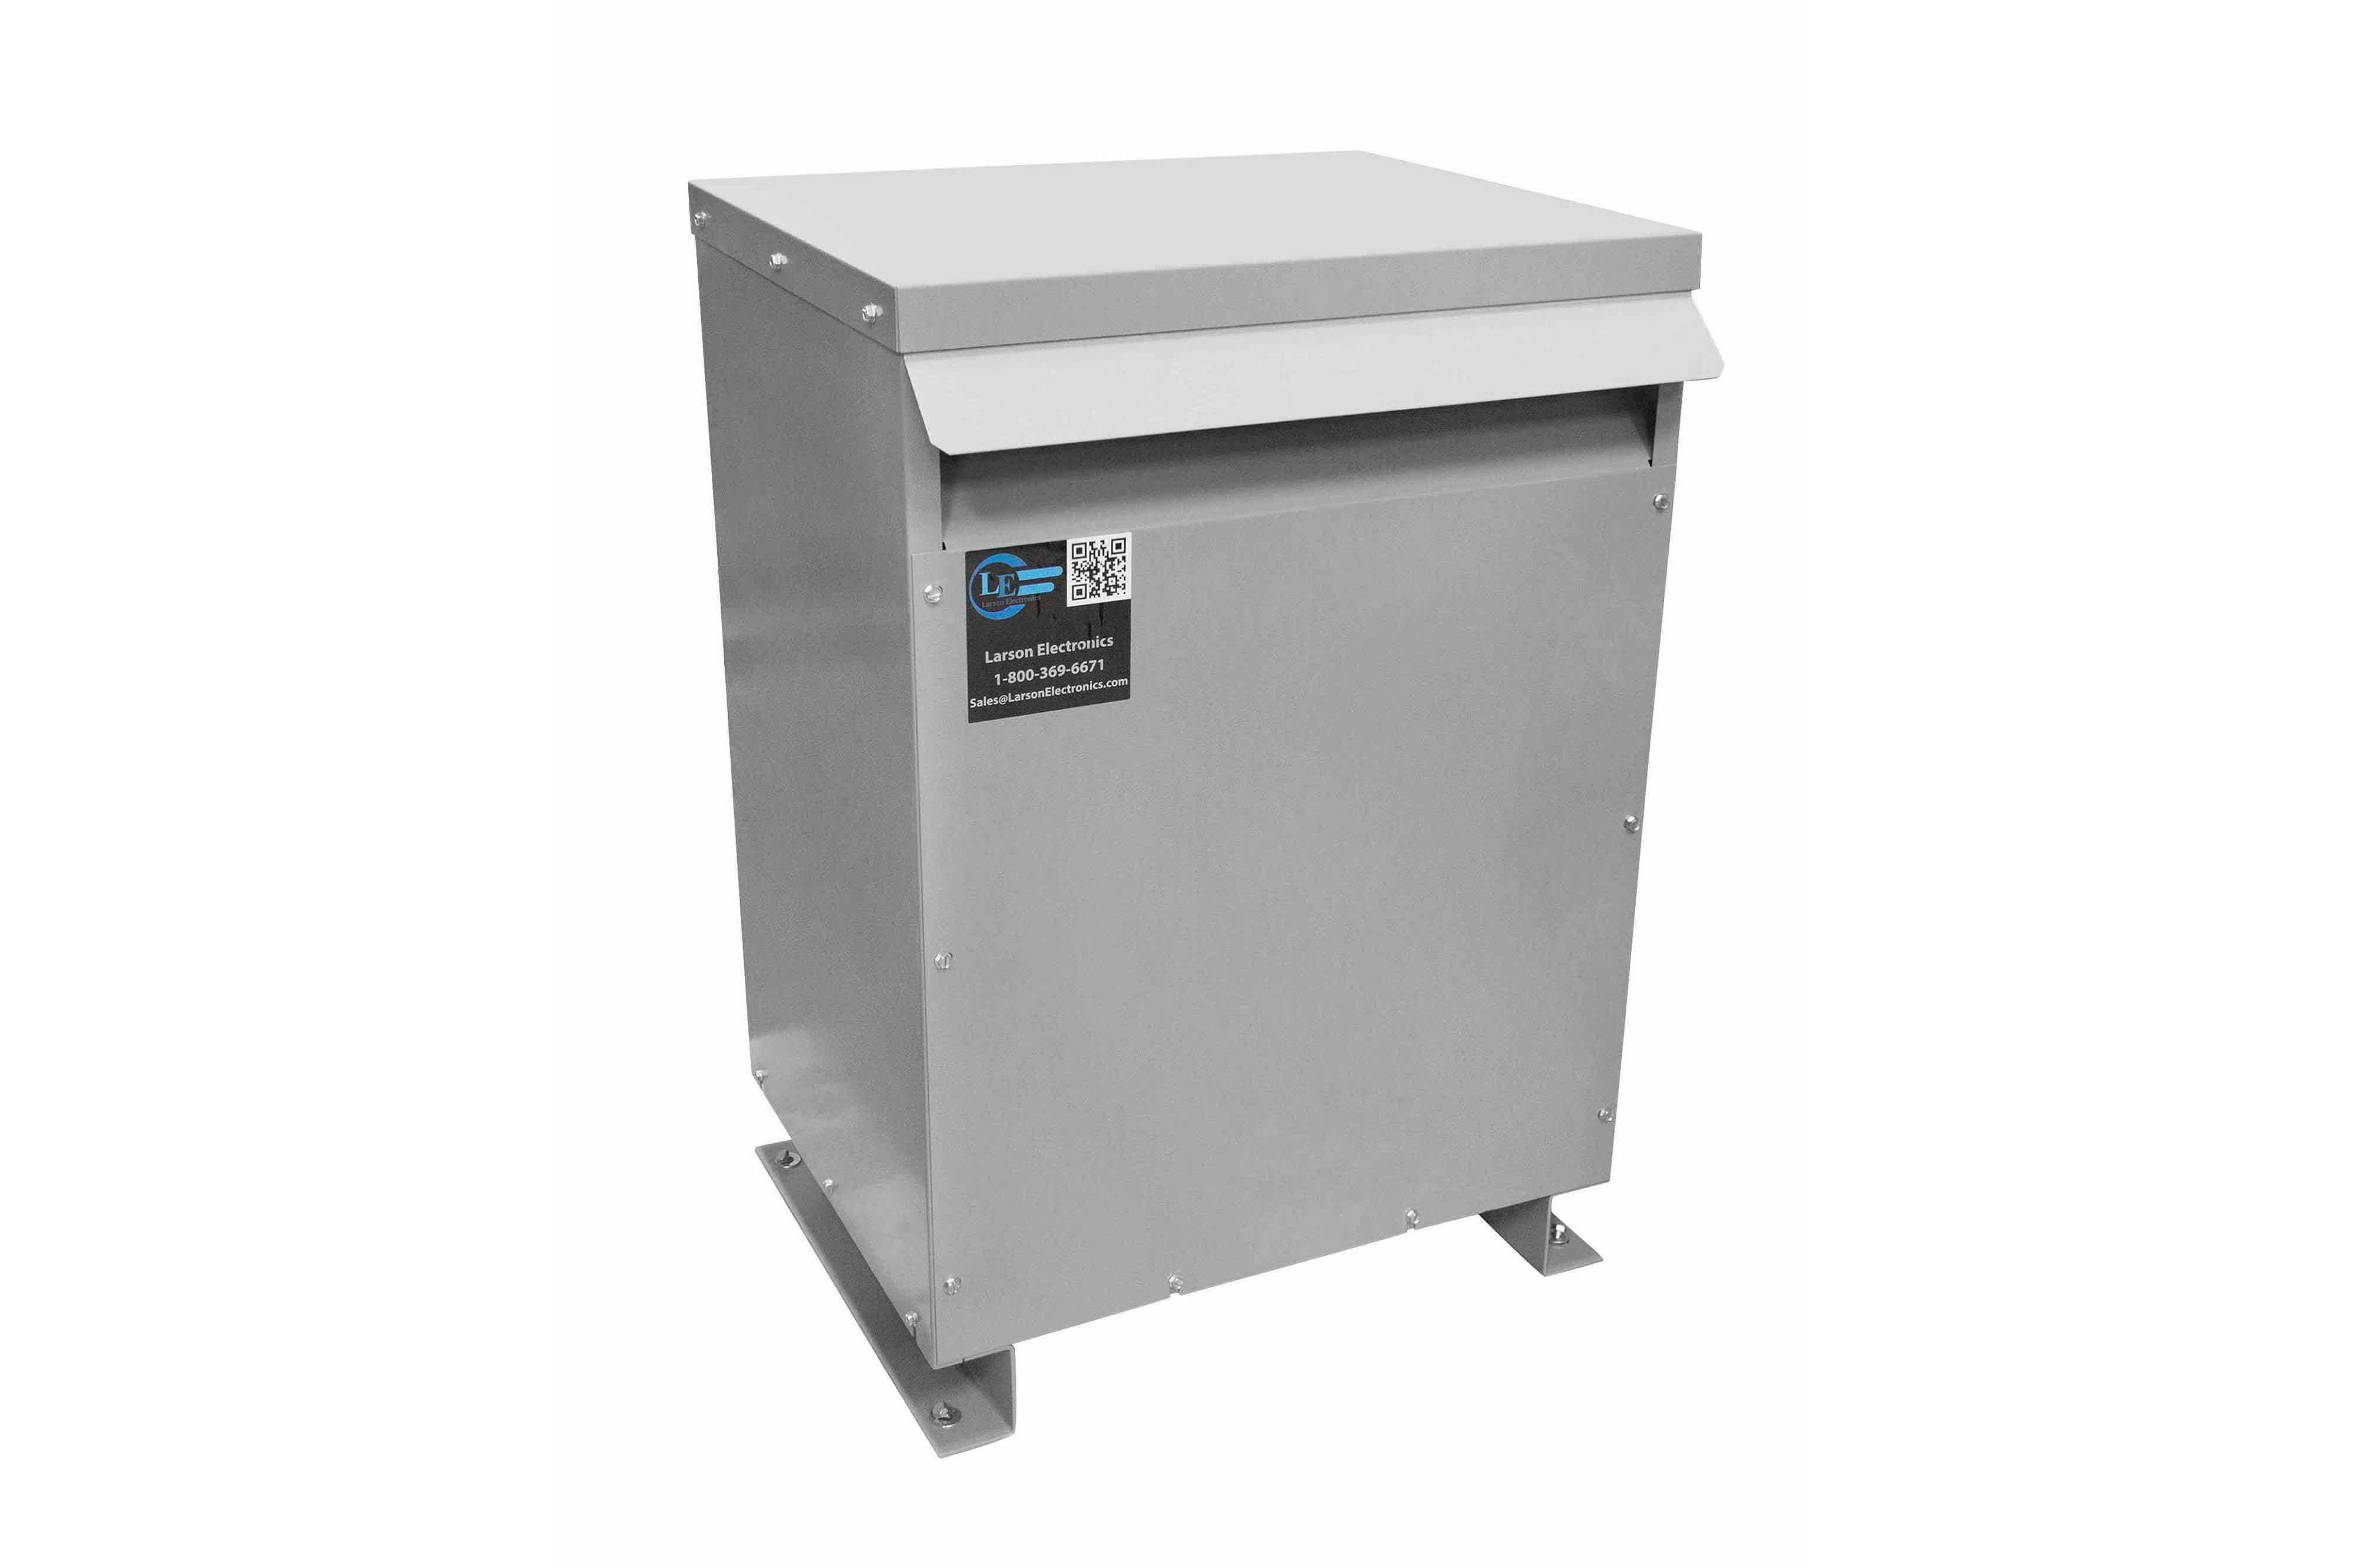 250 kVA 3PH DOE Transformer, 208V Delta Primary, 600Y/347 Wye-N Secondary, N3R, Ventilated, 60 Hz